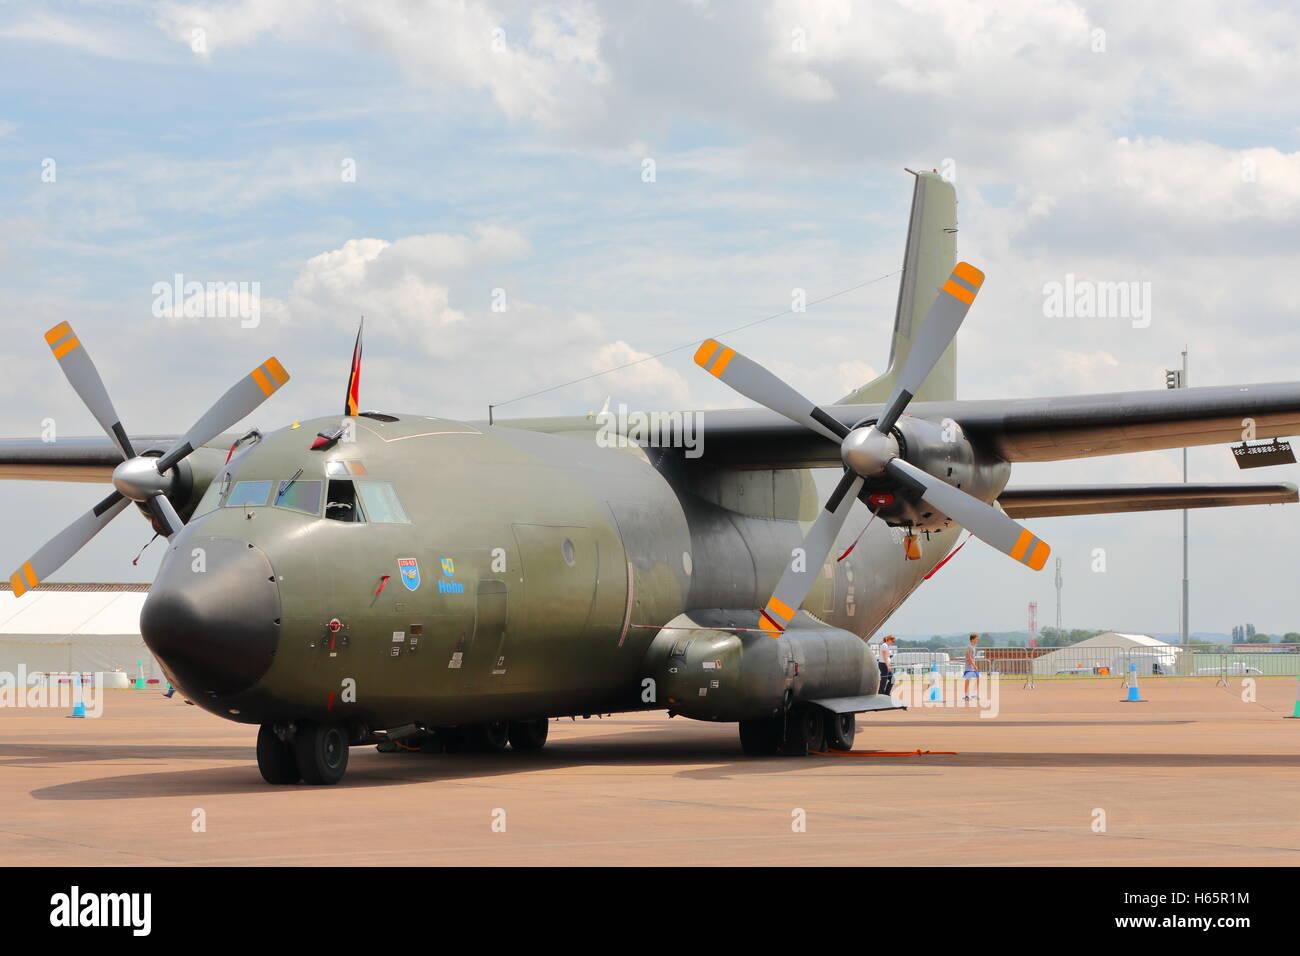 German Transall from LTG63 at RAF Fairford RIAT 2014 - Stock Image